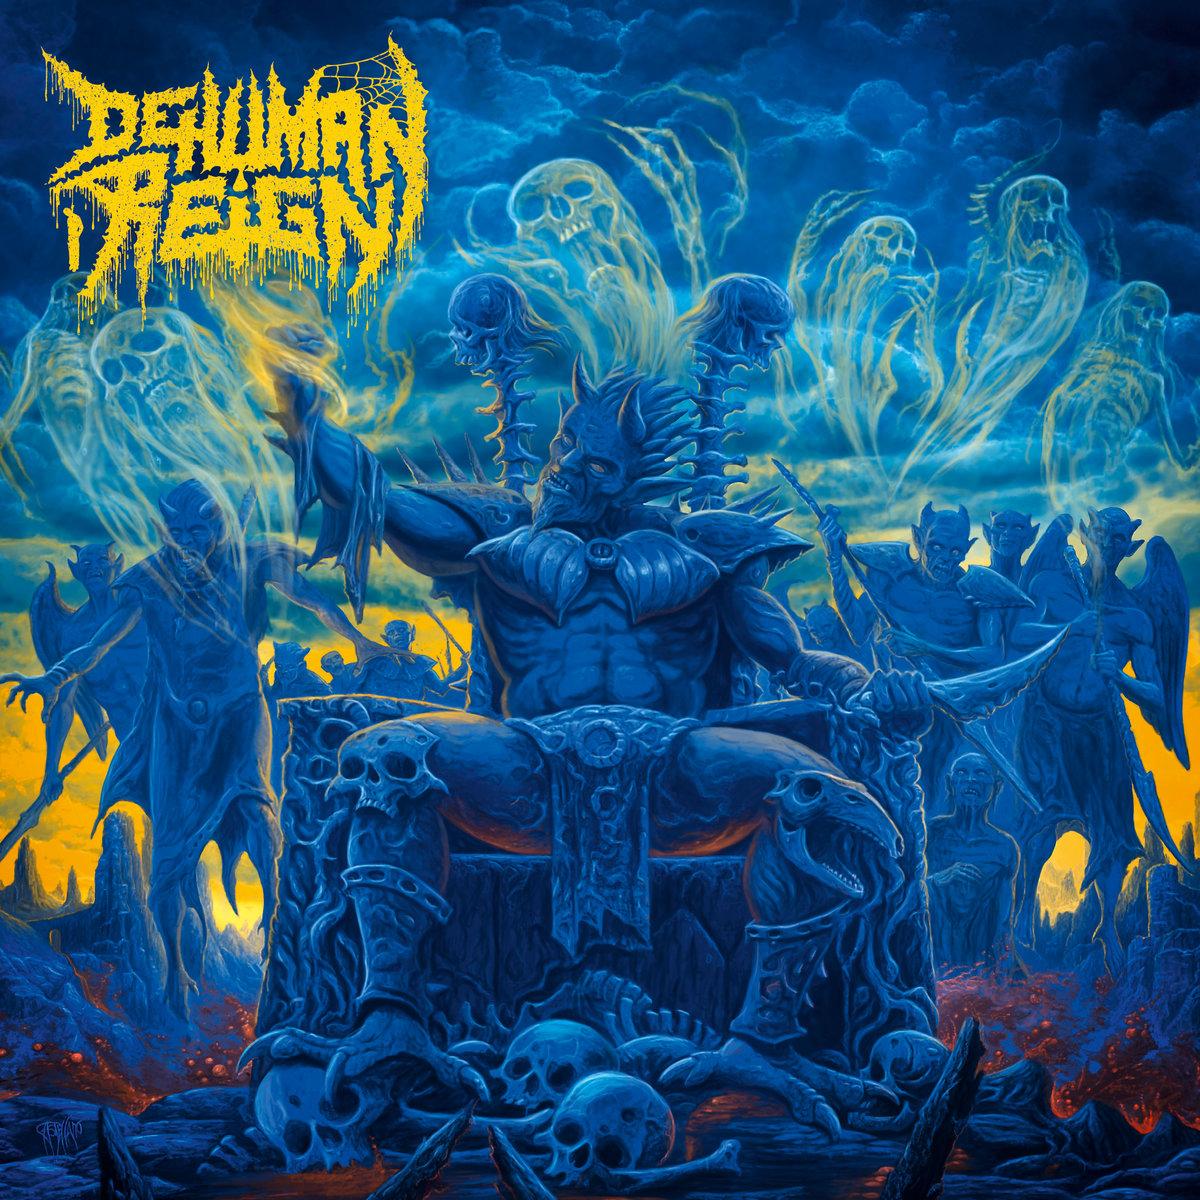 Descending Upon The Oblivious Dehuman Reign